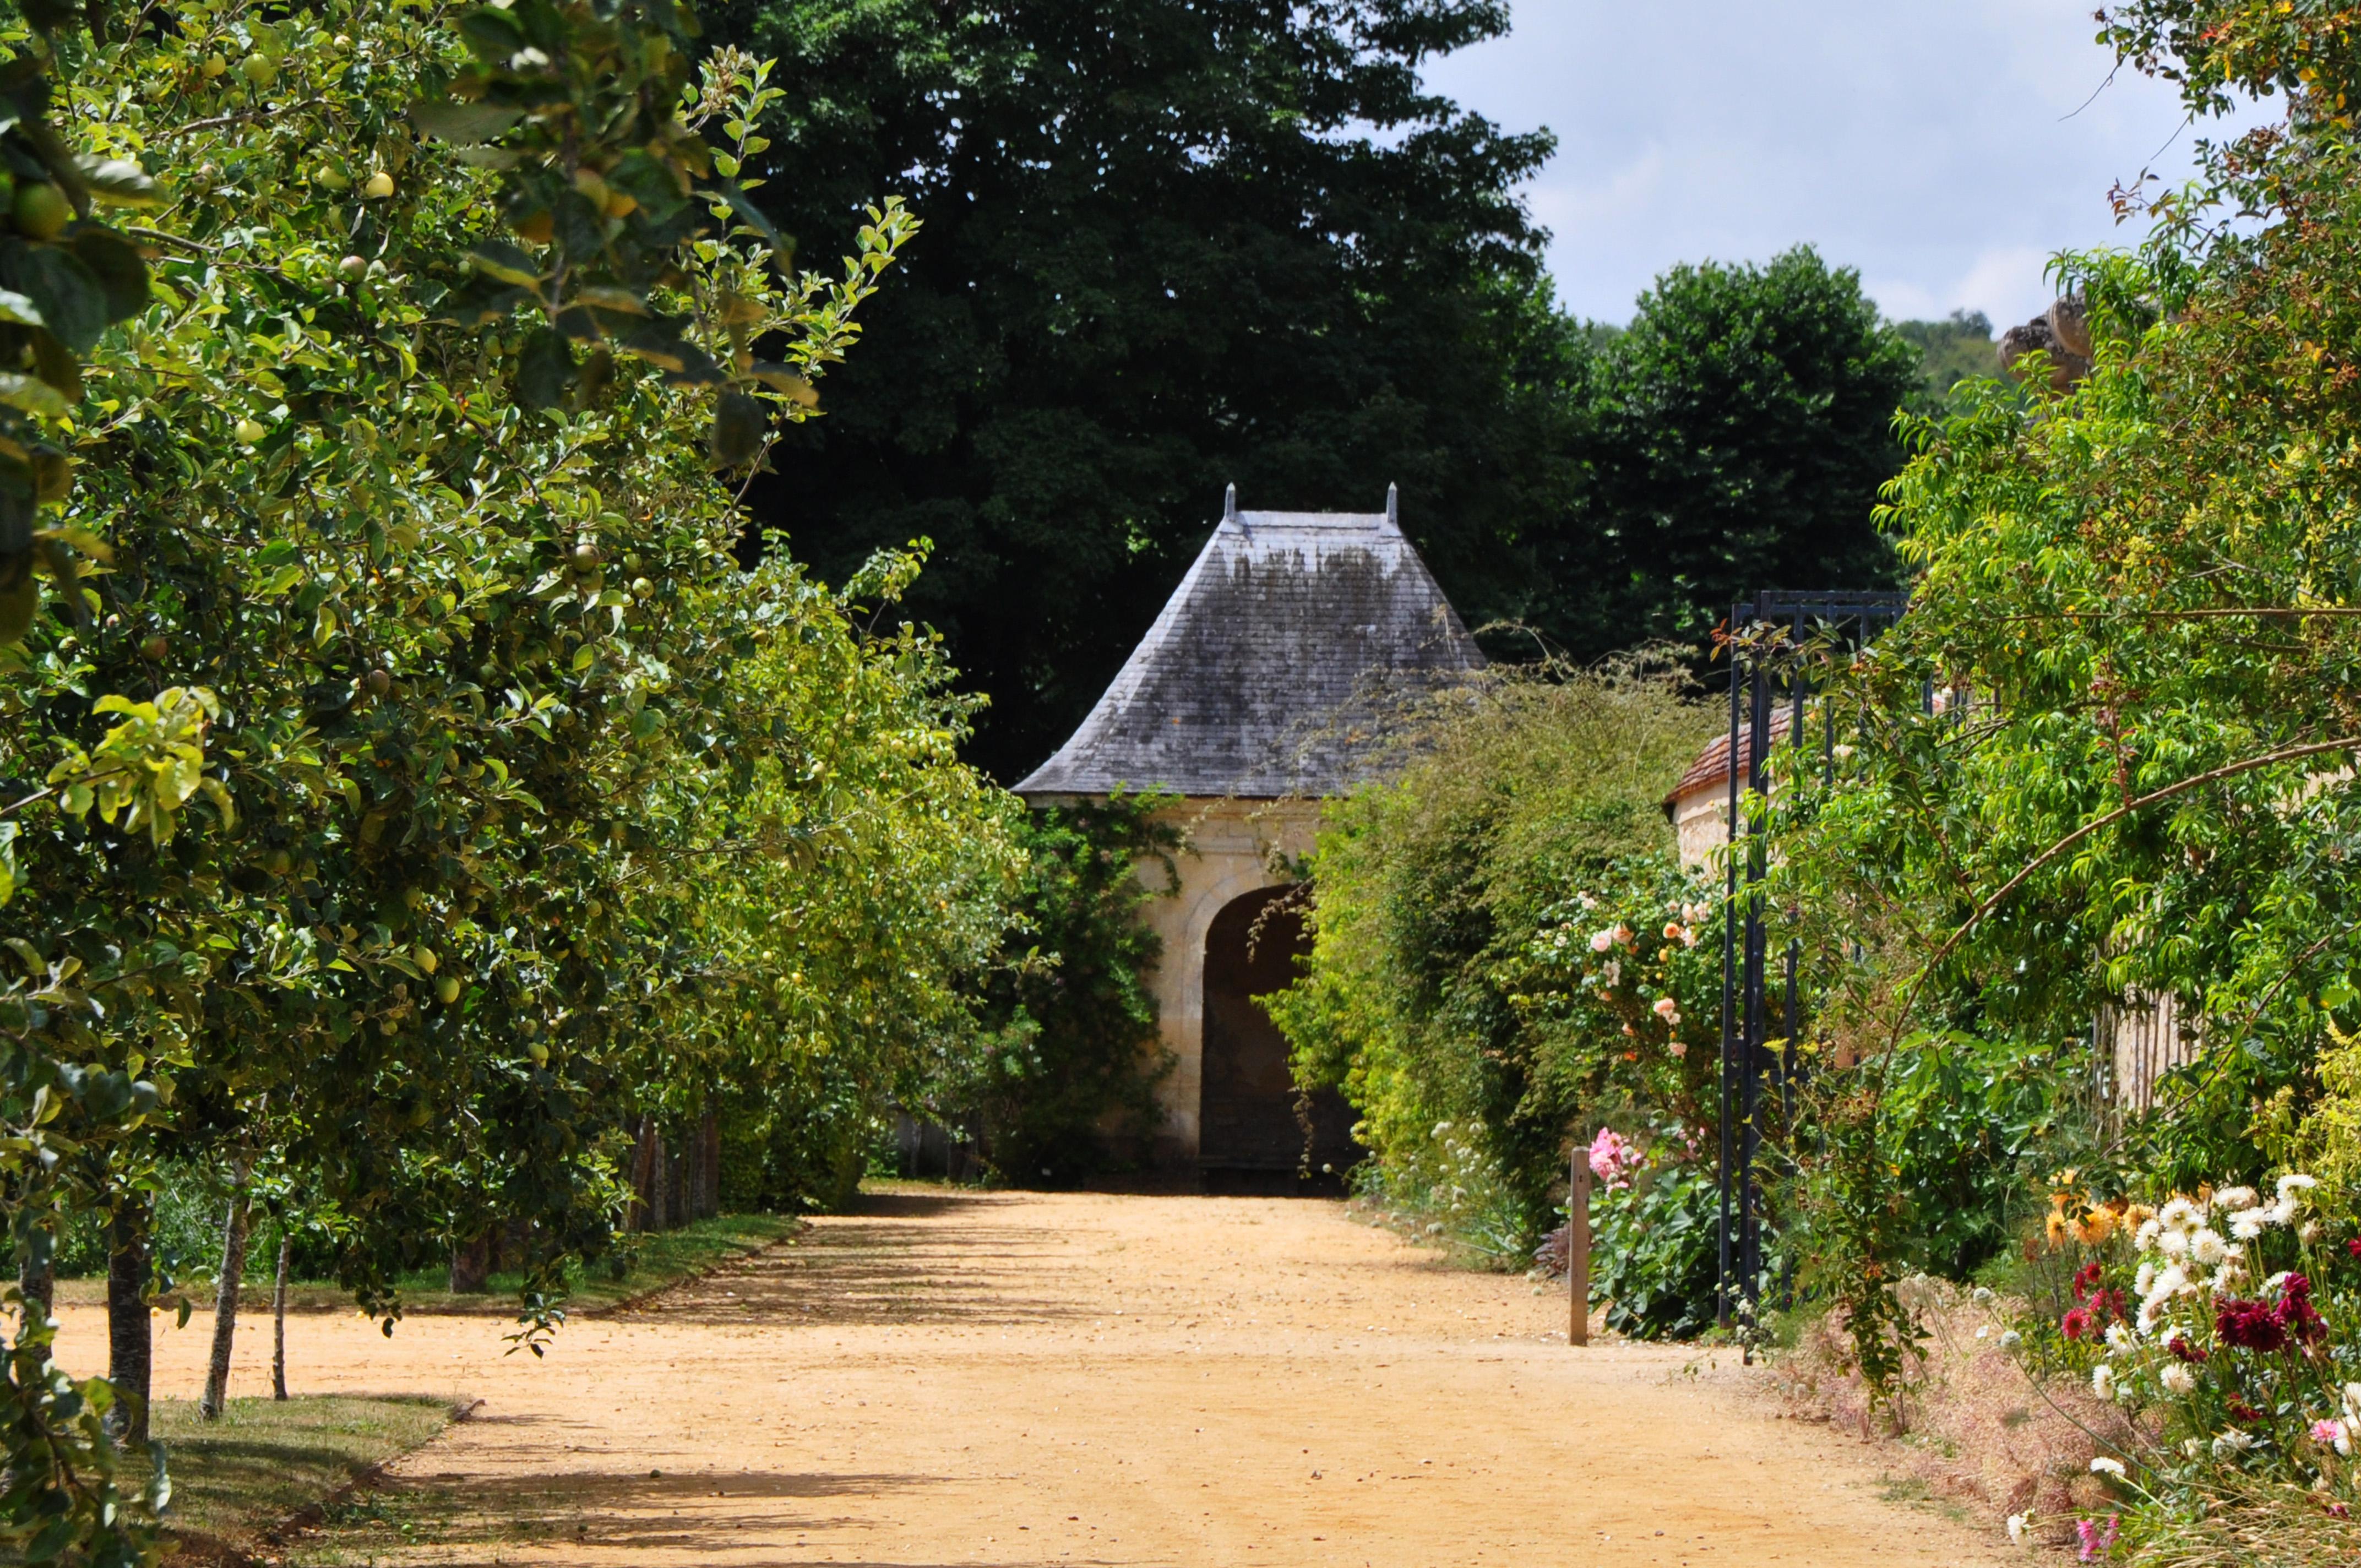 File:abri De Jardin, La Roche-Guyon (France).jpg - Wikimedia ... concernant Abri De Jardin Original